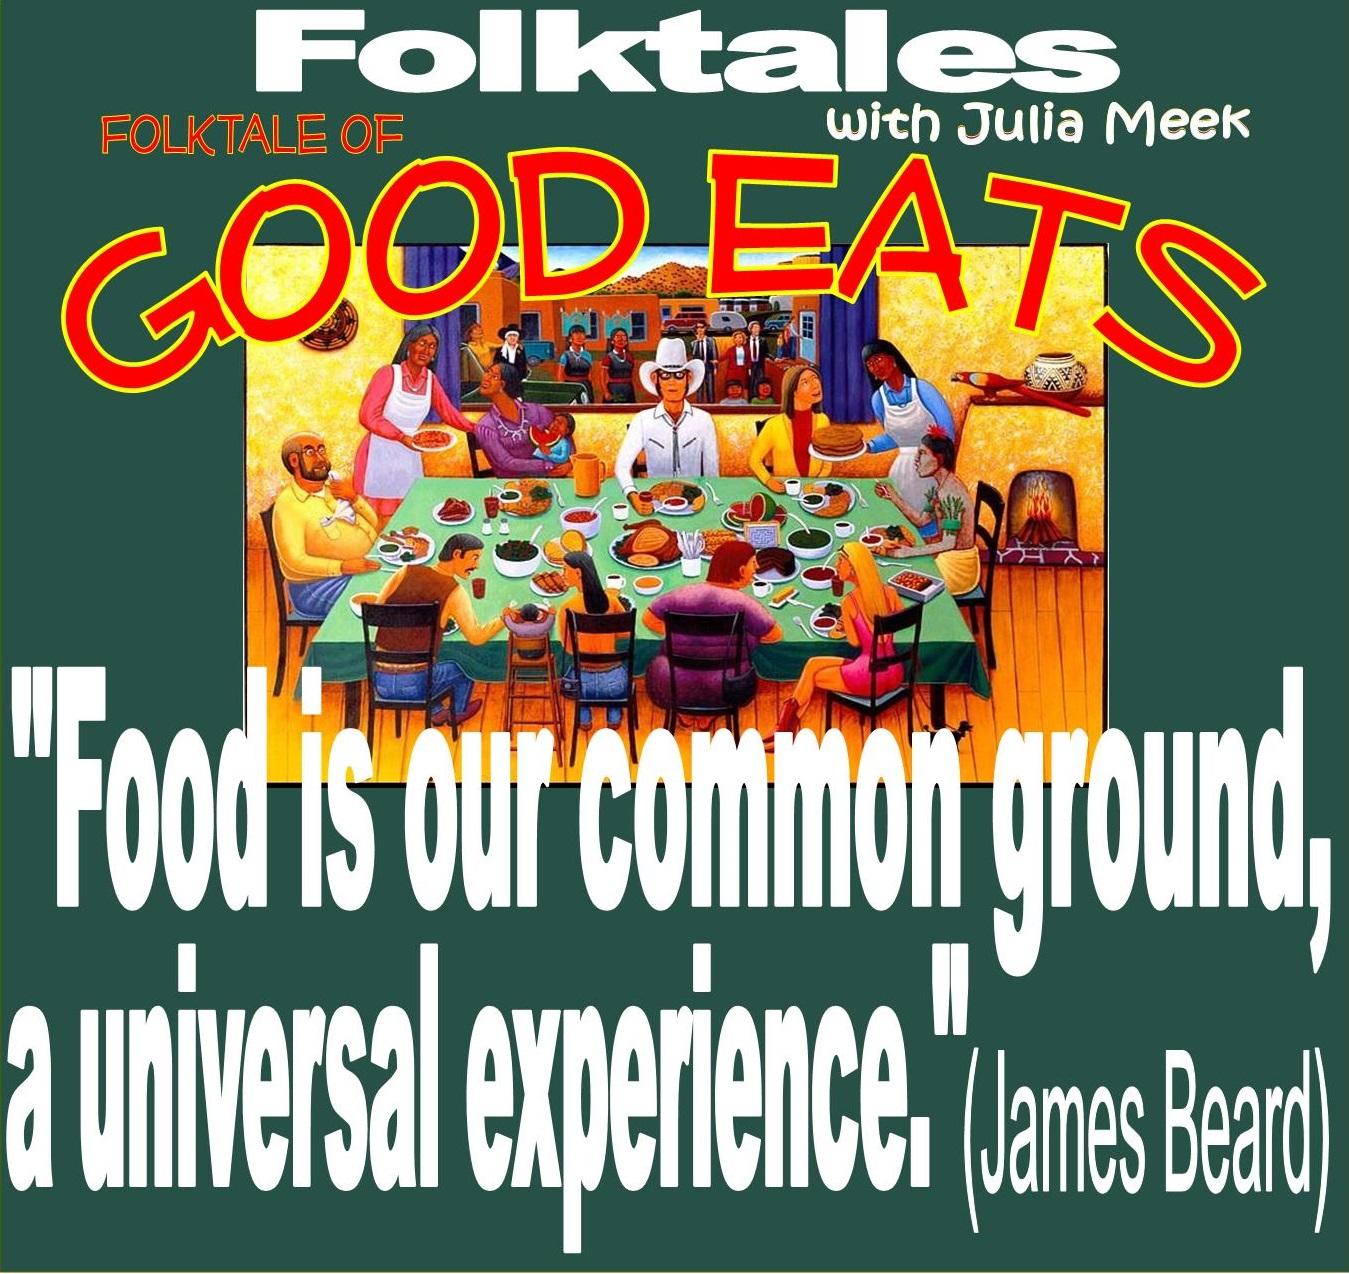 Caption: WBOI's Folktale of Good Eats, Credit: Julia Meek